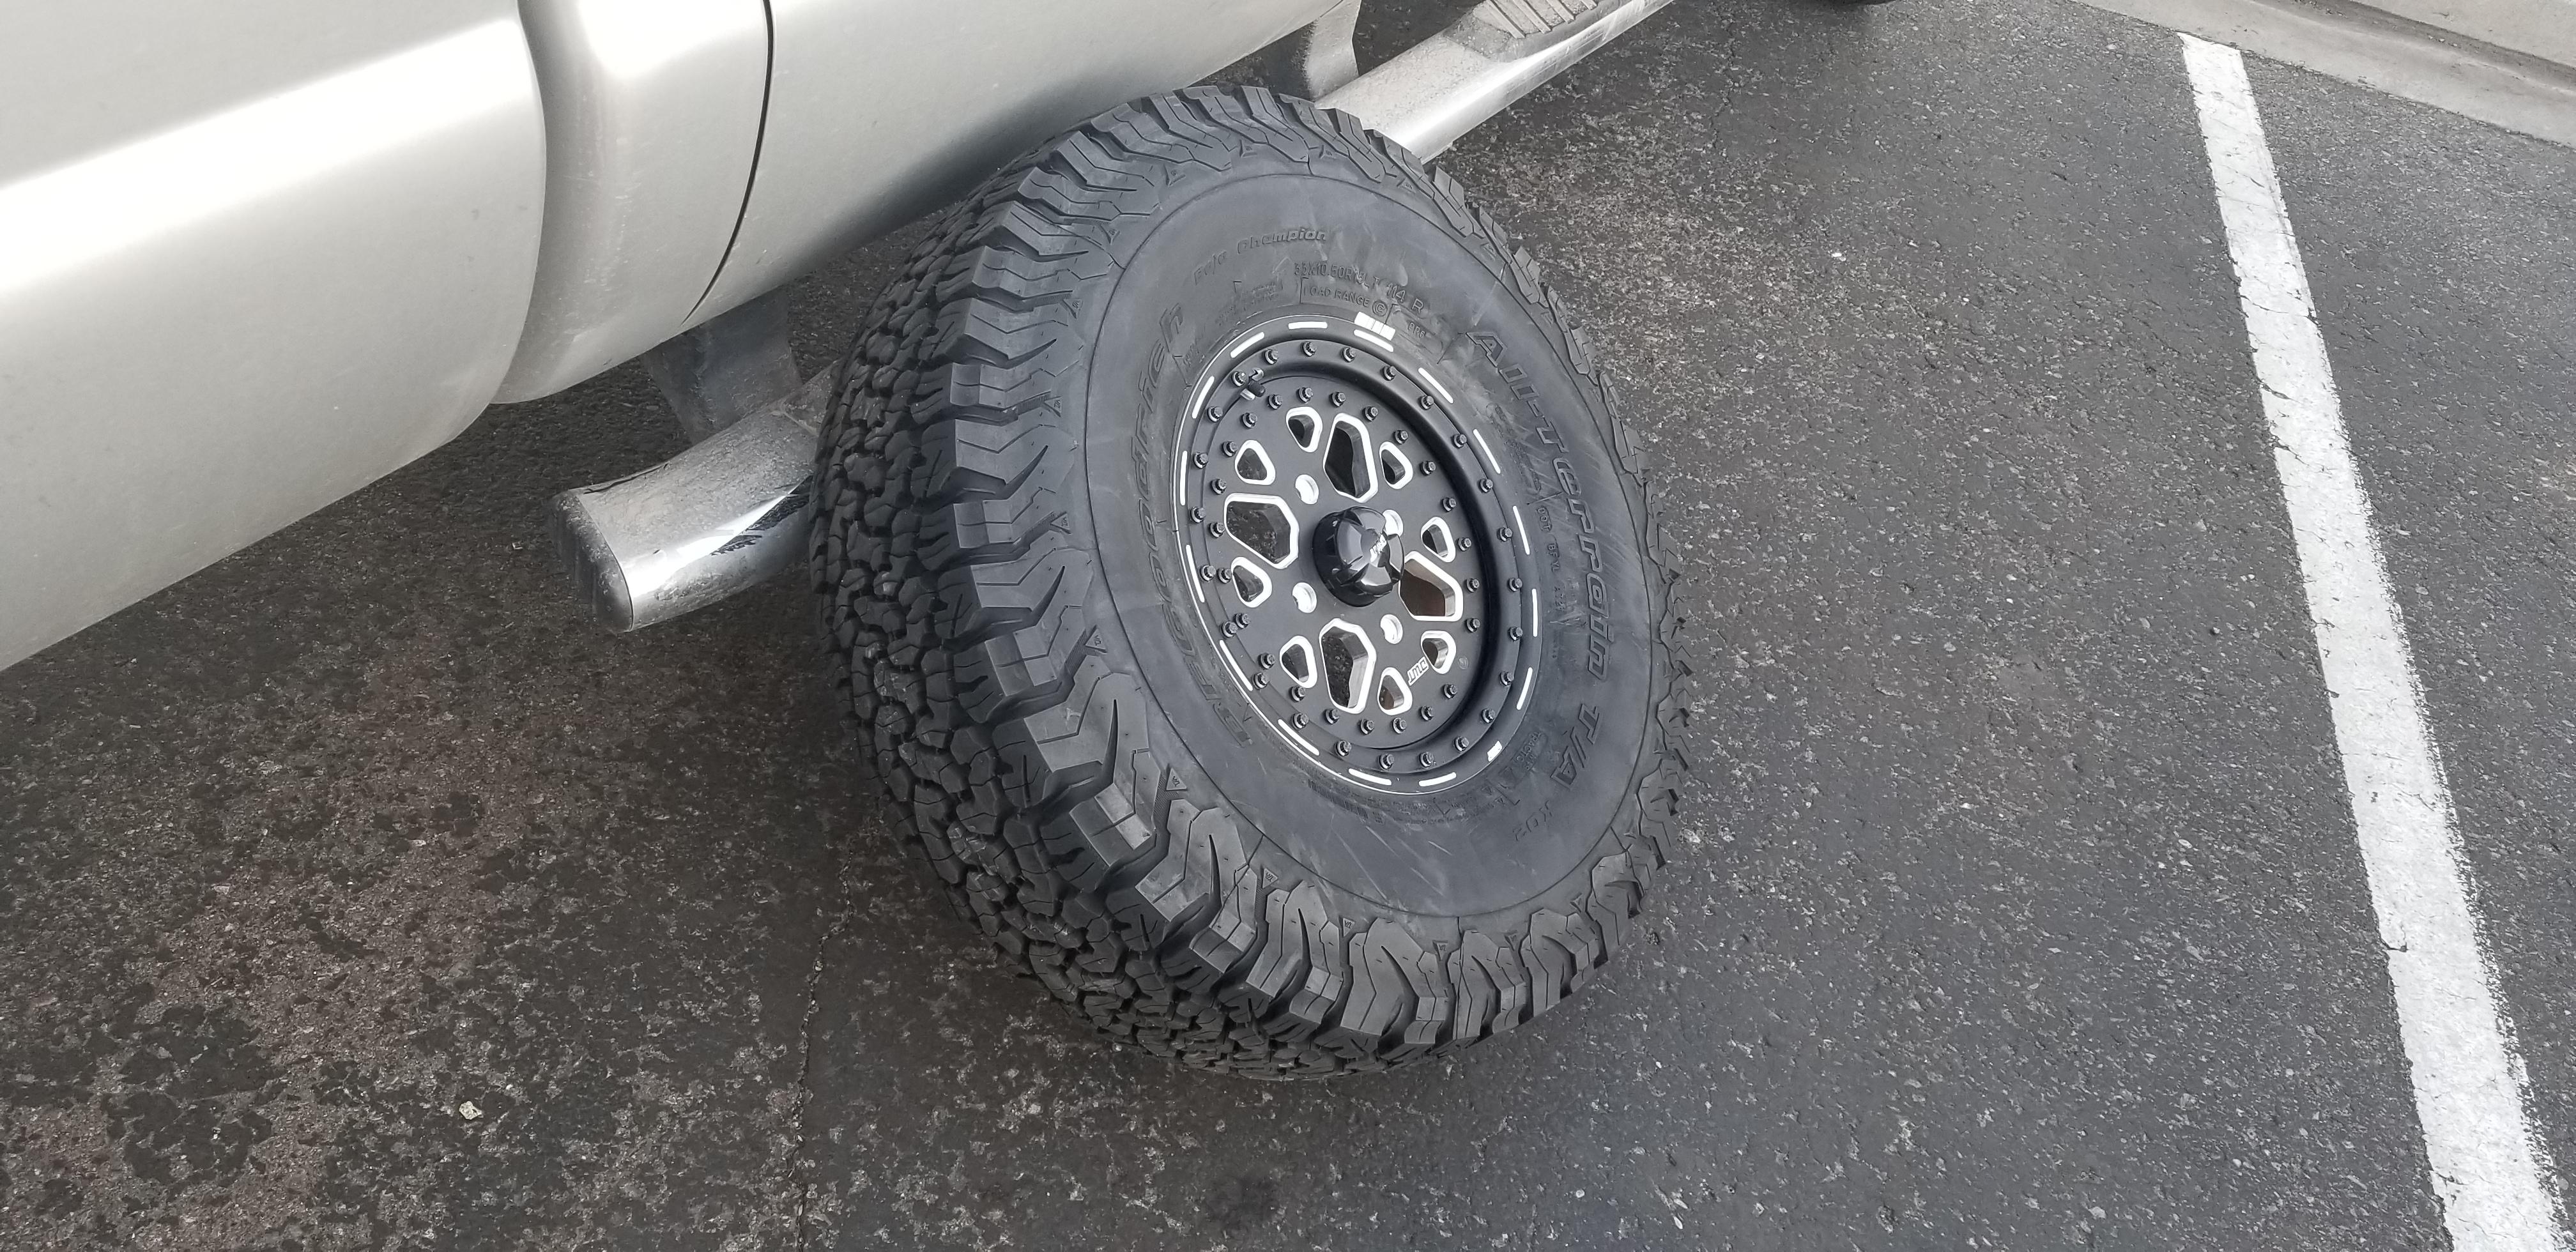 32x10.50r15 KO2 Tires